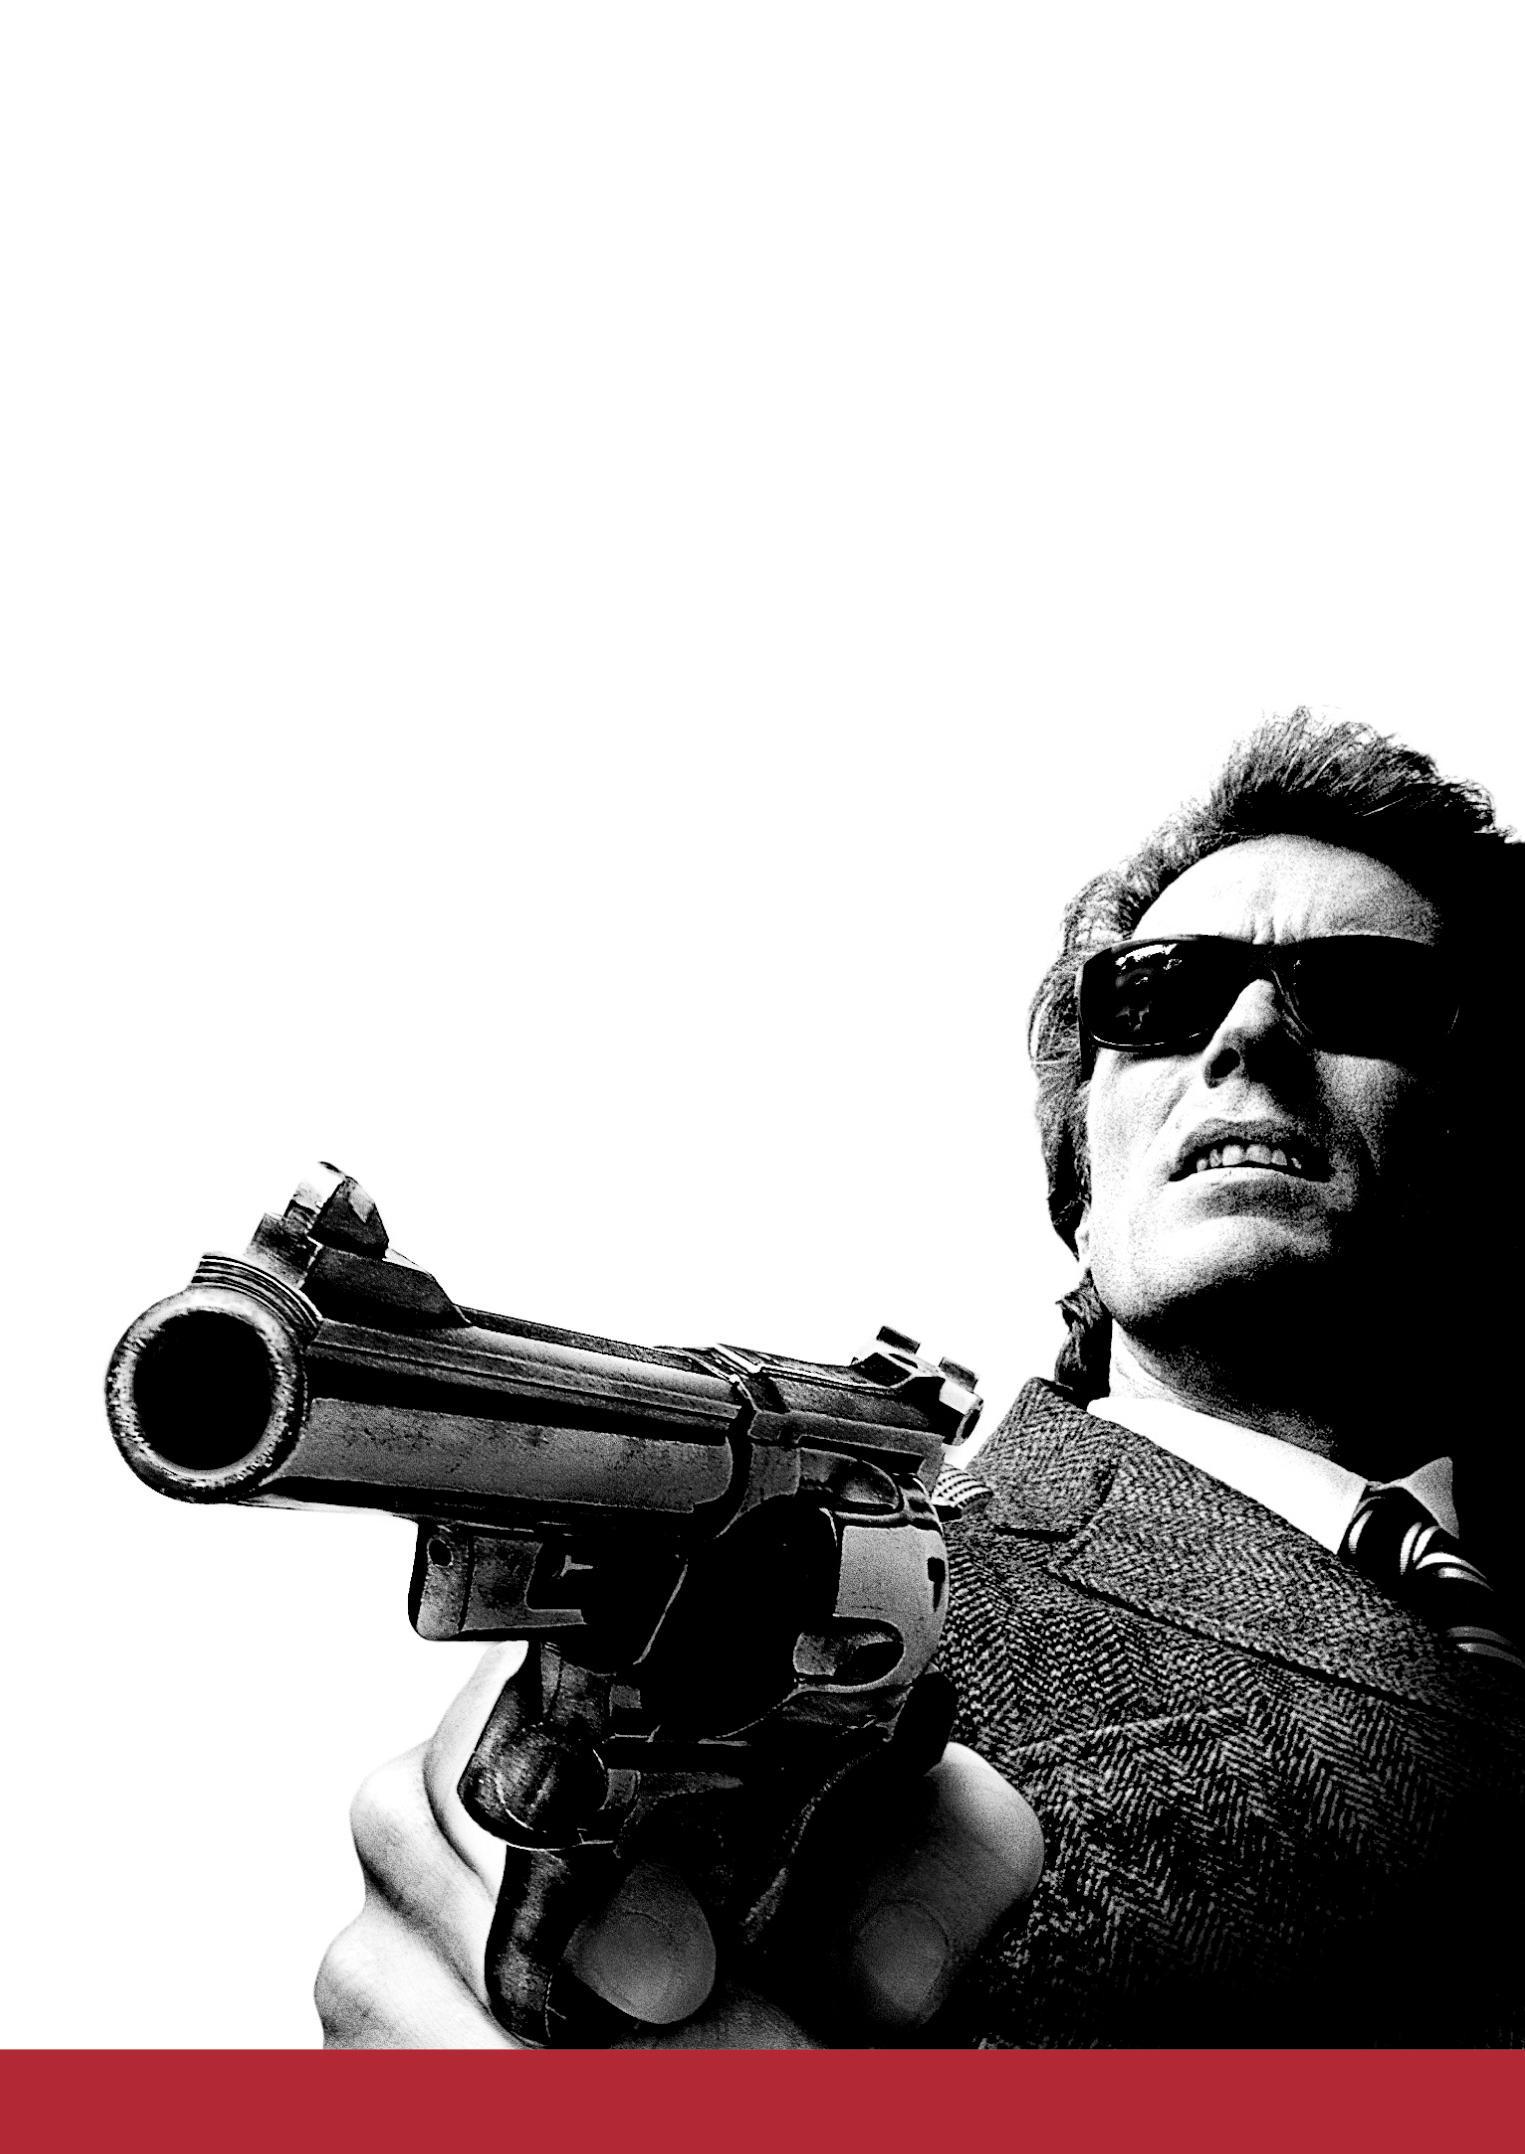 Dirty Harry (1971) - Don Siegel